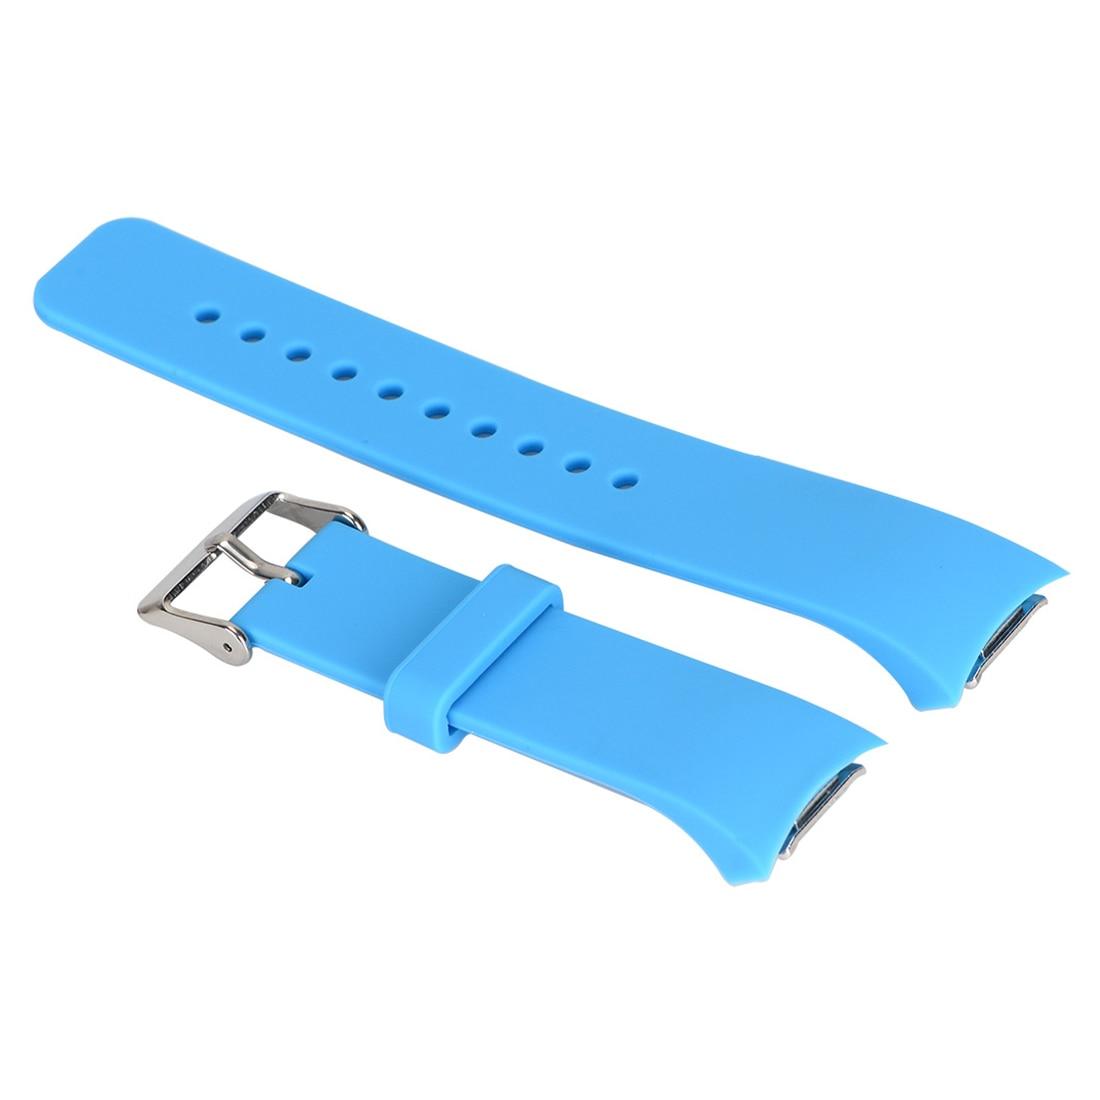 Luxury Silicone Watch Band Strap for Samsung Galaxy S2 Gear SM-R720 Sky blue eache silicone watch band strap replacement watch band can fit for swatch 17mm 19mm men women